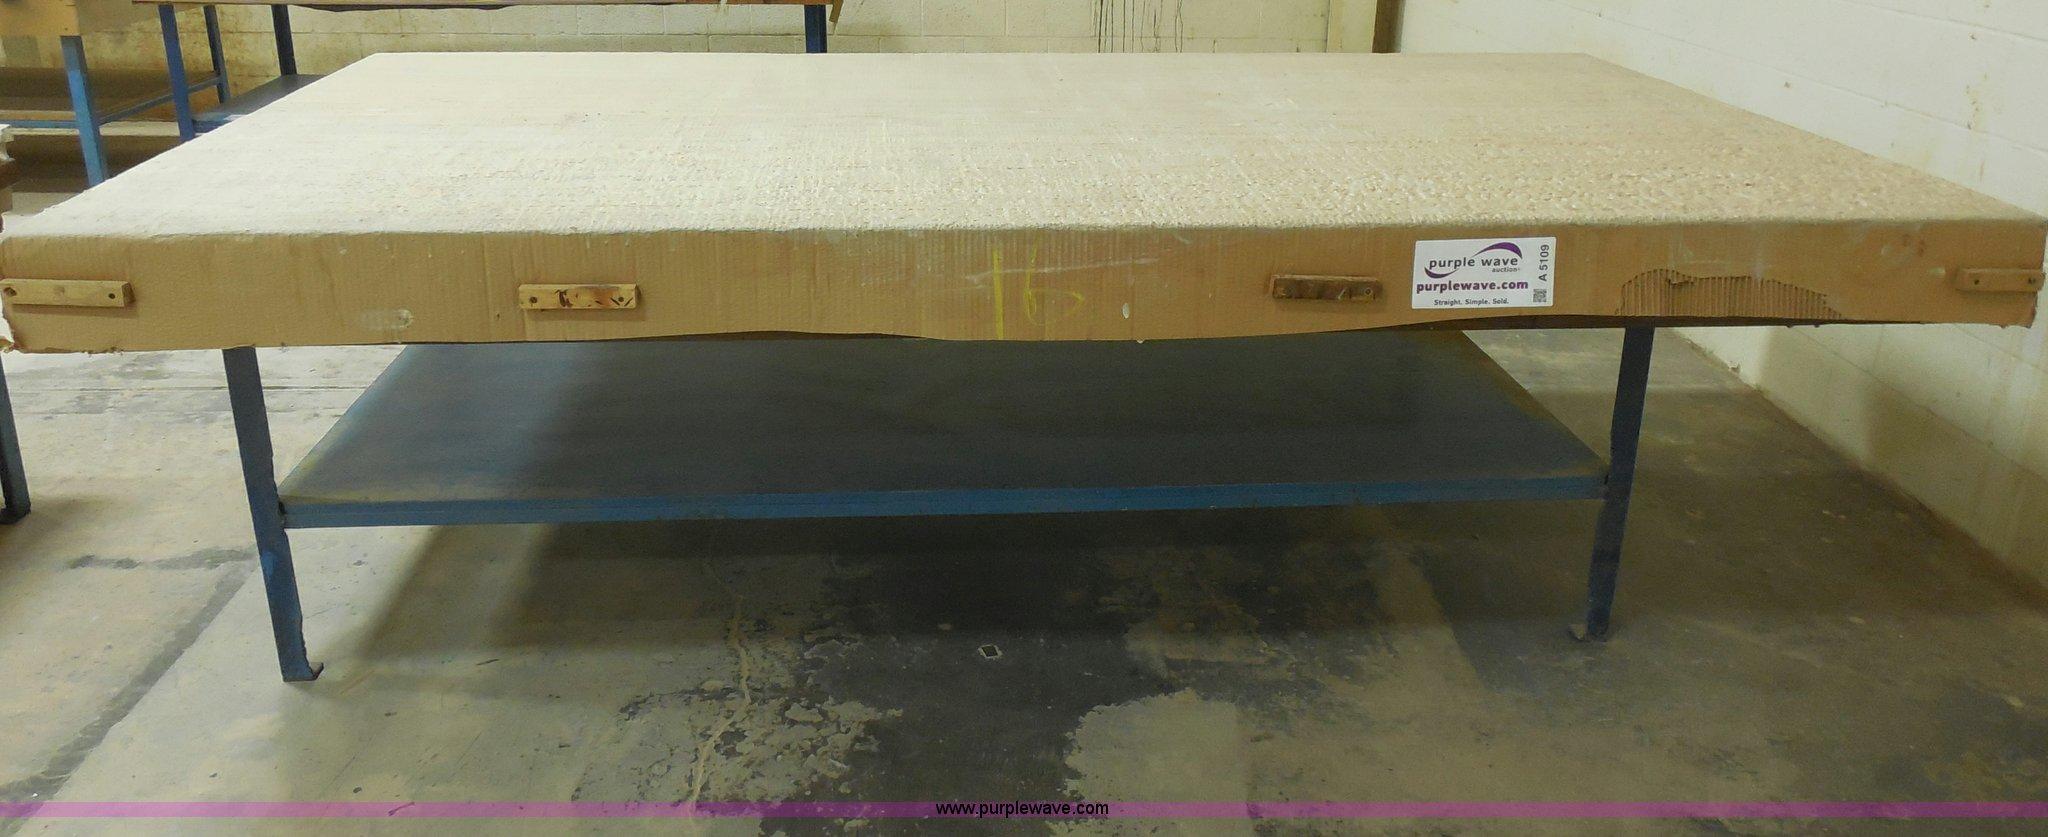 Sensational Work Bench Item A5109 Sold April 17 Midwest Auction P Beatyapartments Chair Design Images Beatyapartmentscom